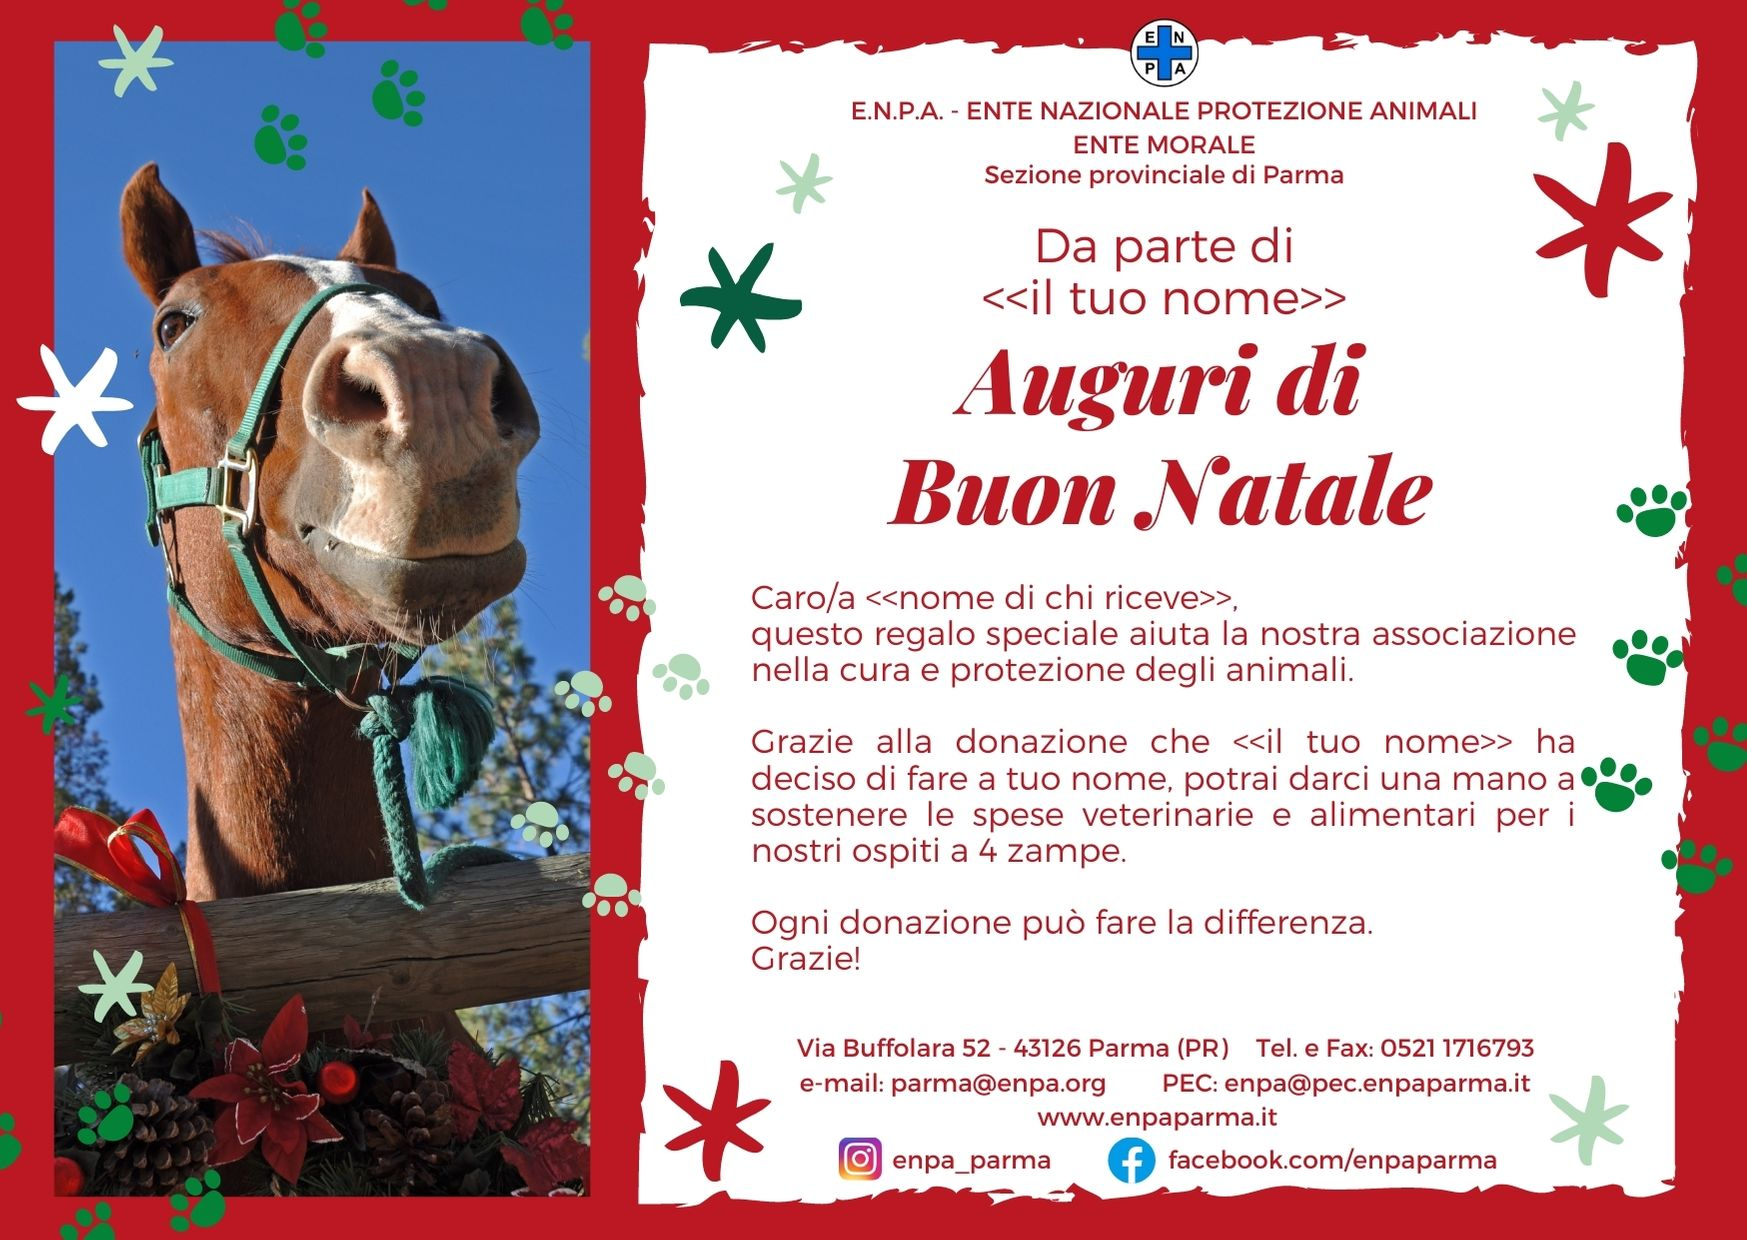 Natale Con ENPA (cavallo - 5€)